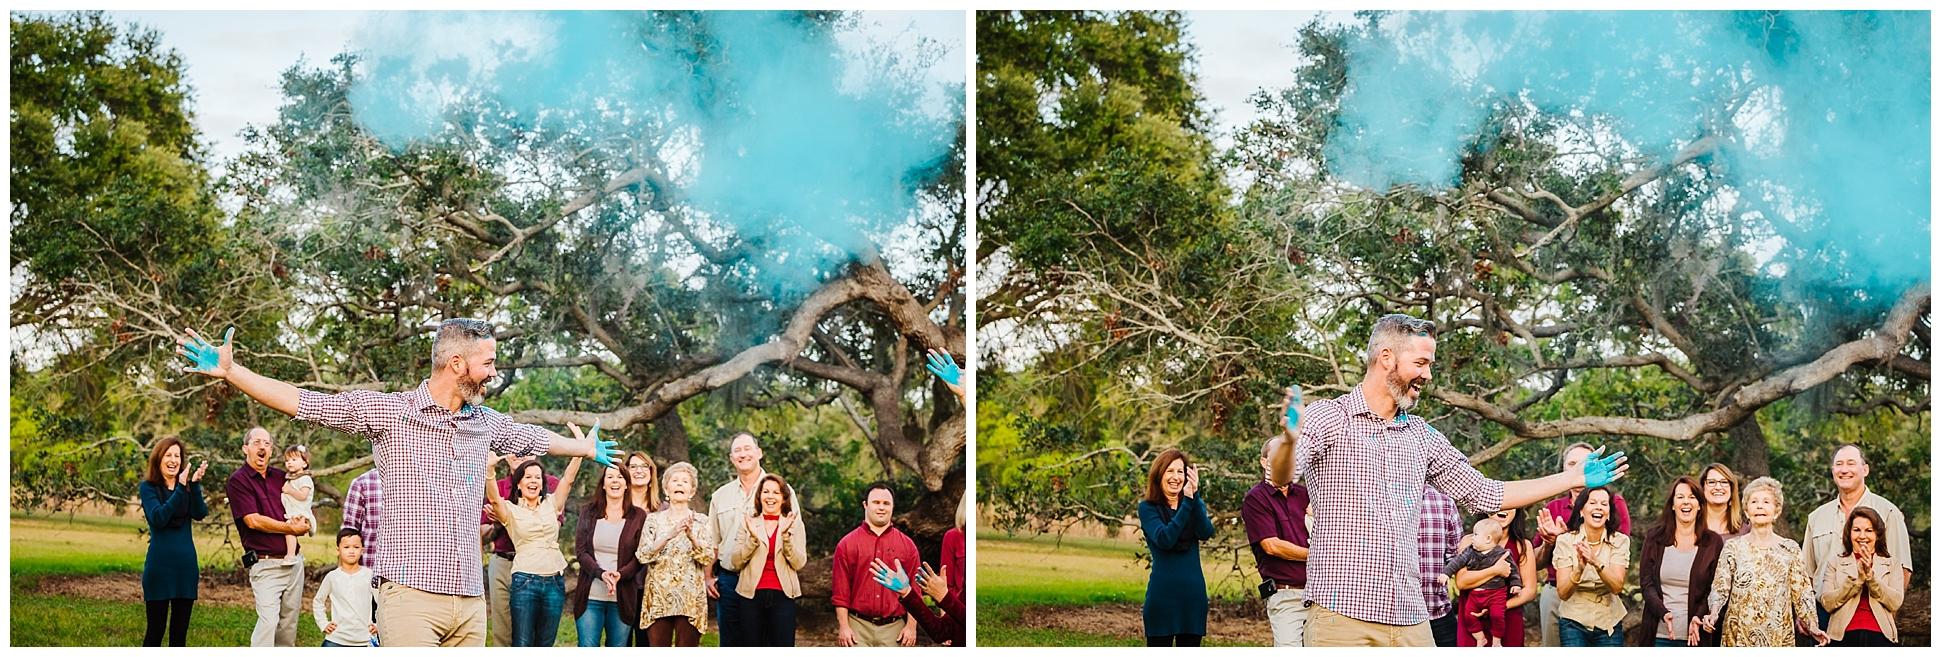 tampa-oak tree-park-holiday-gender reveal-family session_0044.jpg